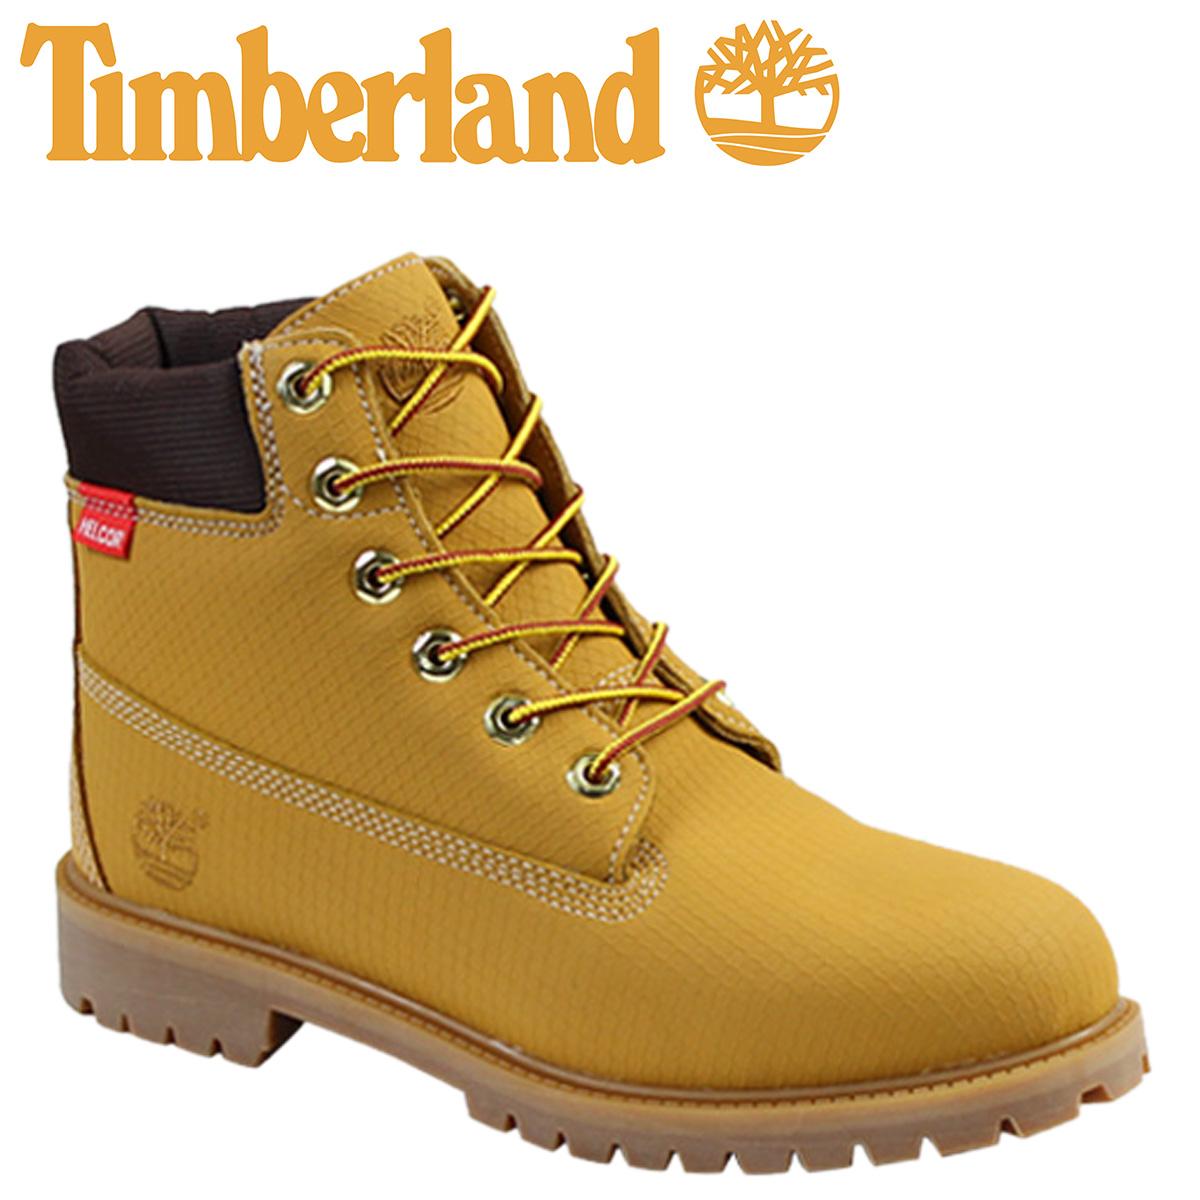 00bce6aed308b Timberland Timberland 6 inch premium Scaff proof boots  wheat  6596 R 6inch  Premium Scuffproof Boot ヘルコレザー junior kids child ladies GS  genuine